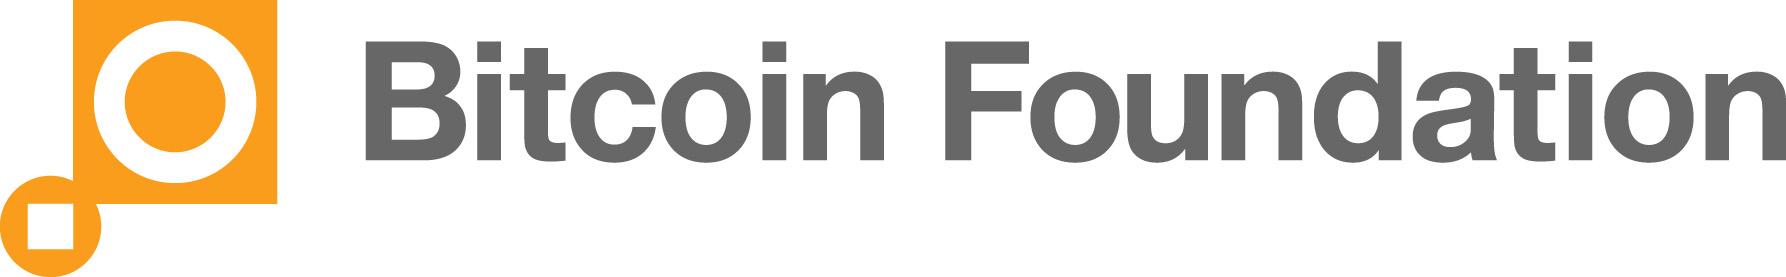 Bitcoin Foundation Leadership to ontmoet met regulators in Washington_[en-nl]_2018-05-30 13-48-58--979 voorkeur aan